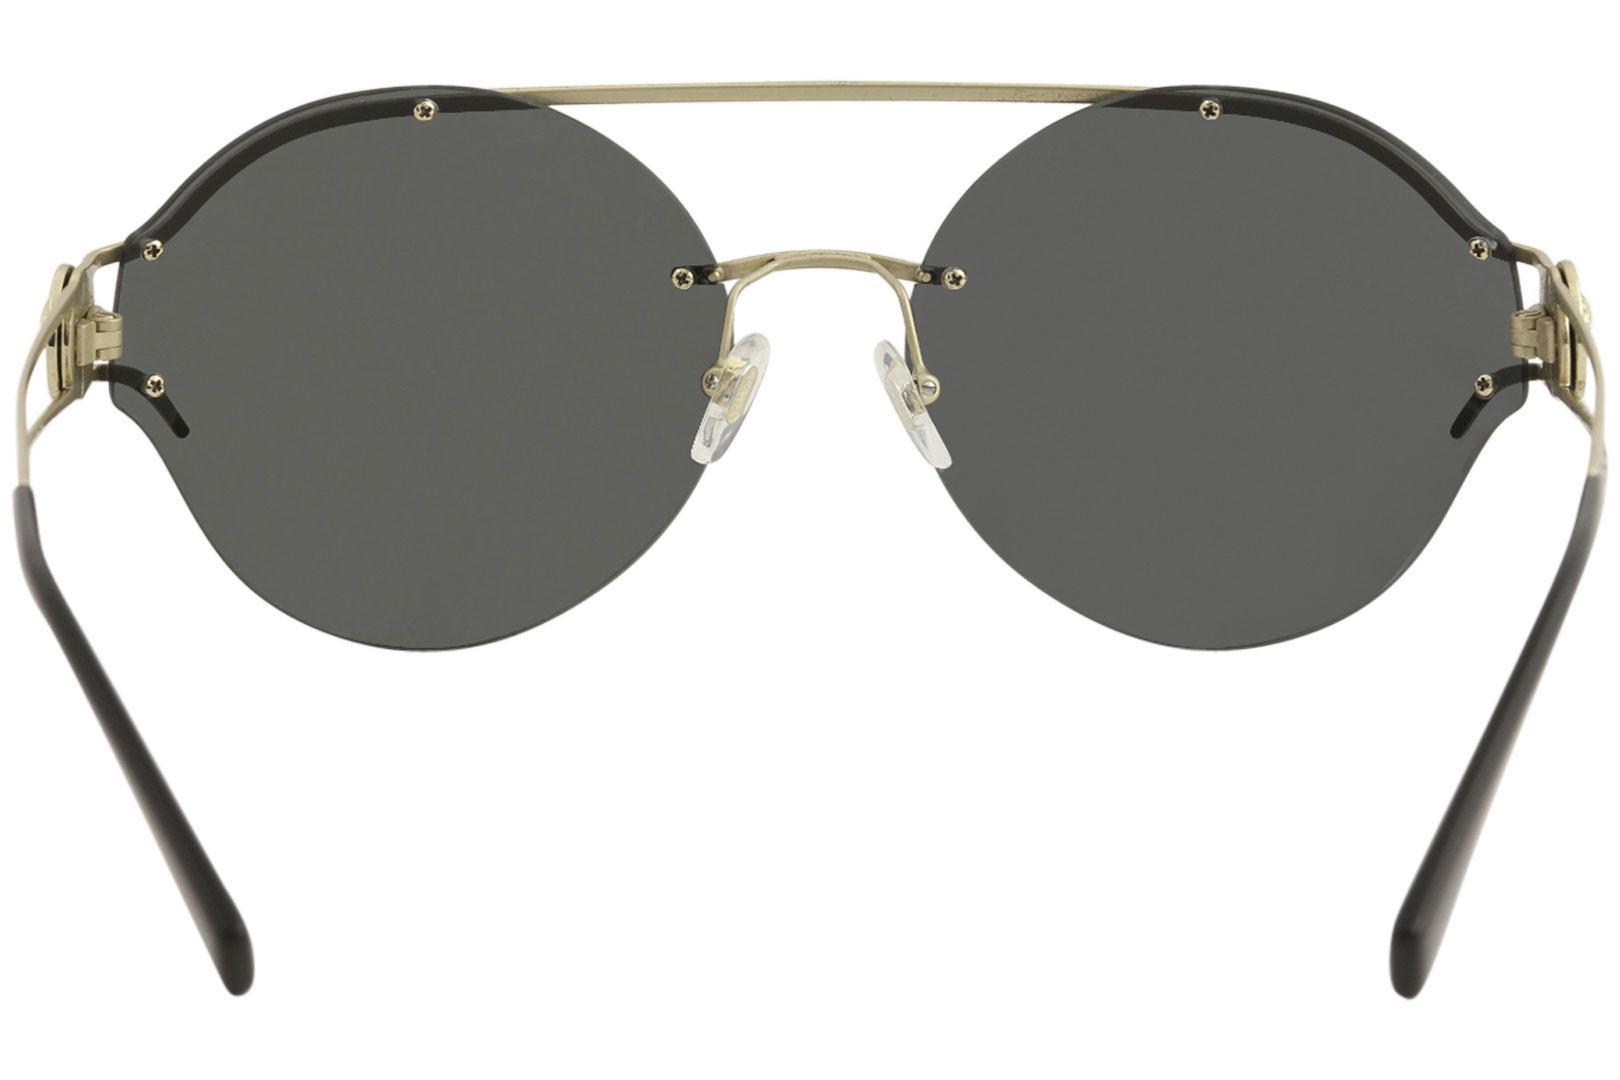 f3e13ef599cc5 Versace Women s VE2184 VE 2184 Fashion Round Sunglasses